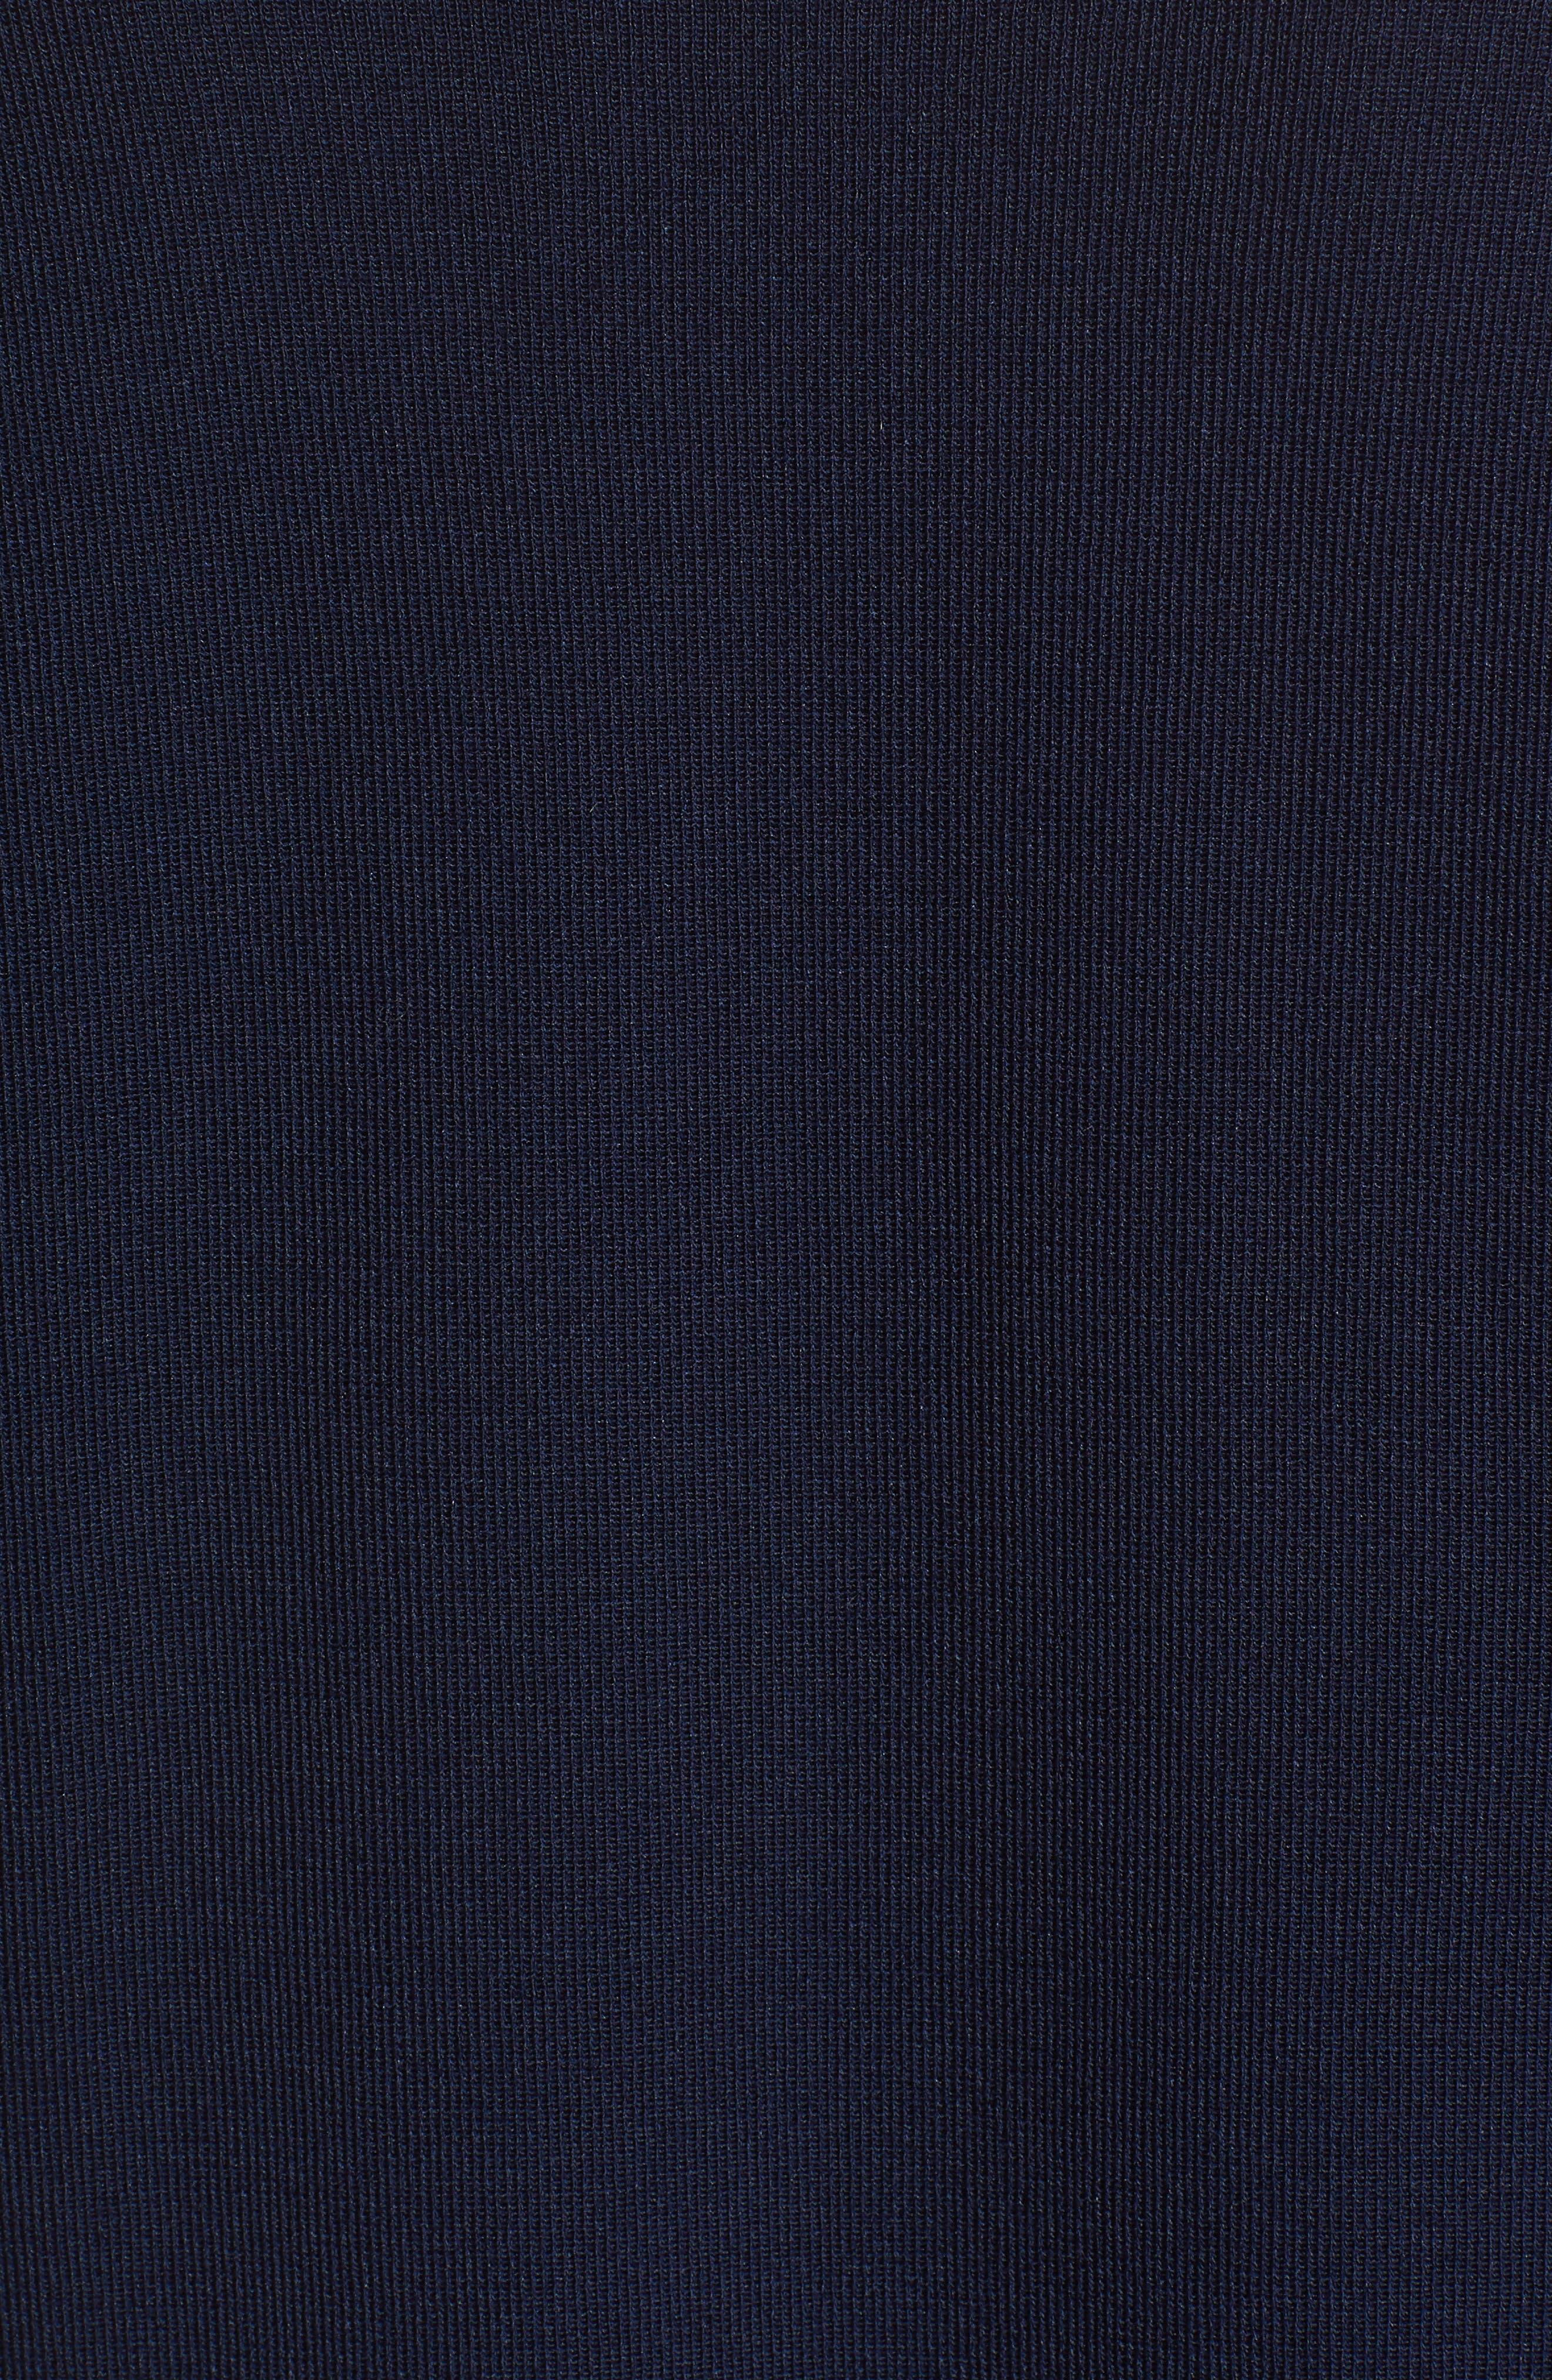 Patch Pocket Cardigan,                             Alternate thumbnail 11, color,